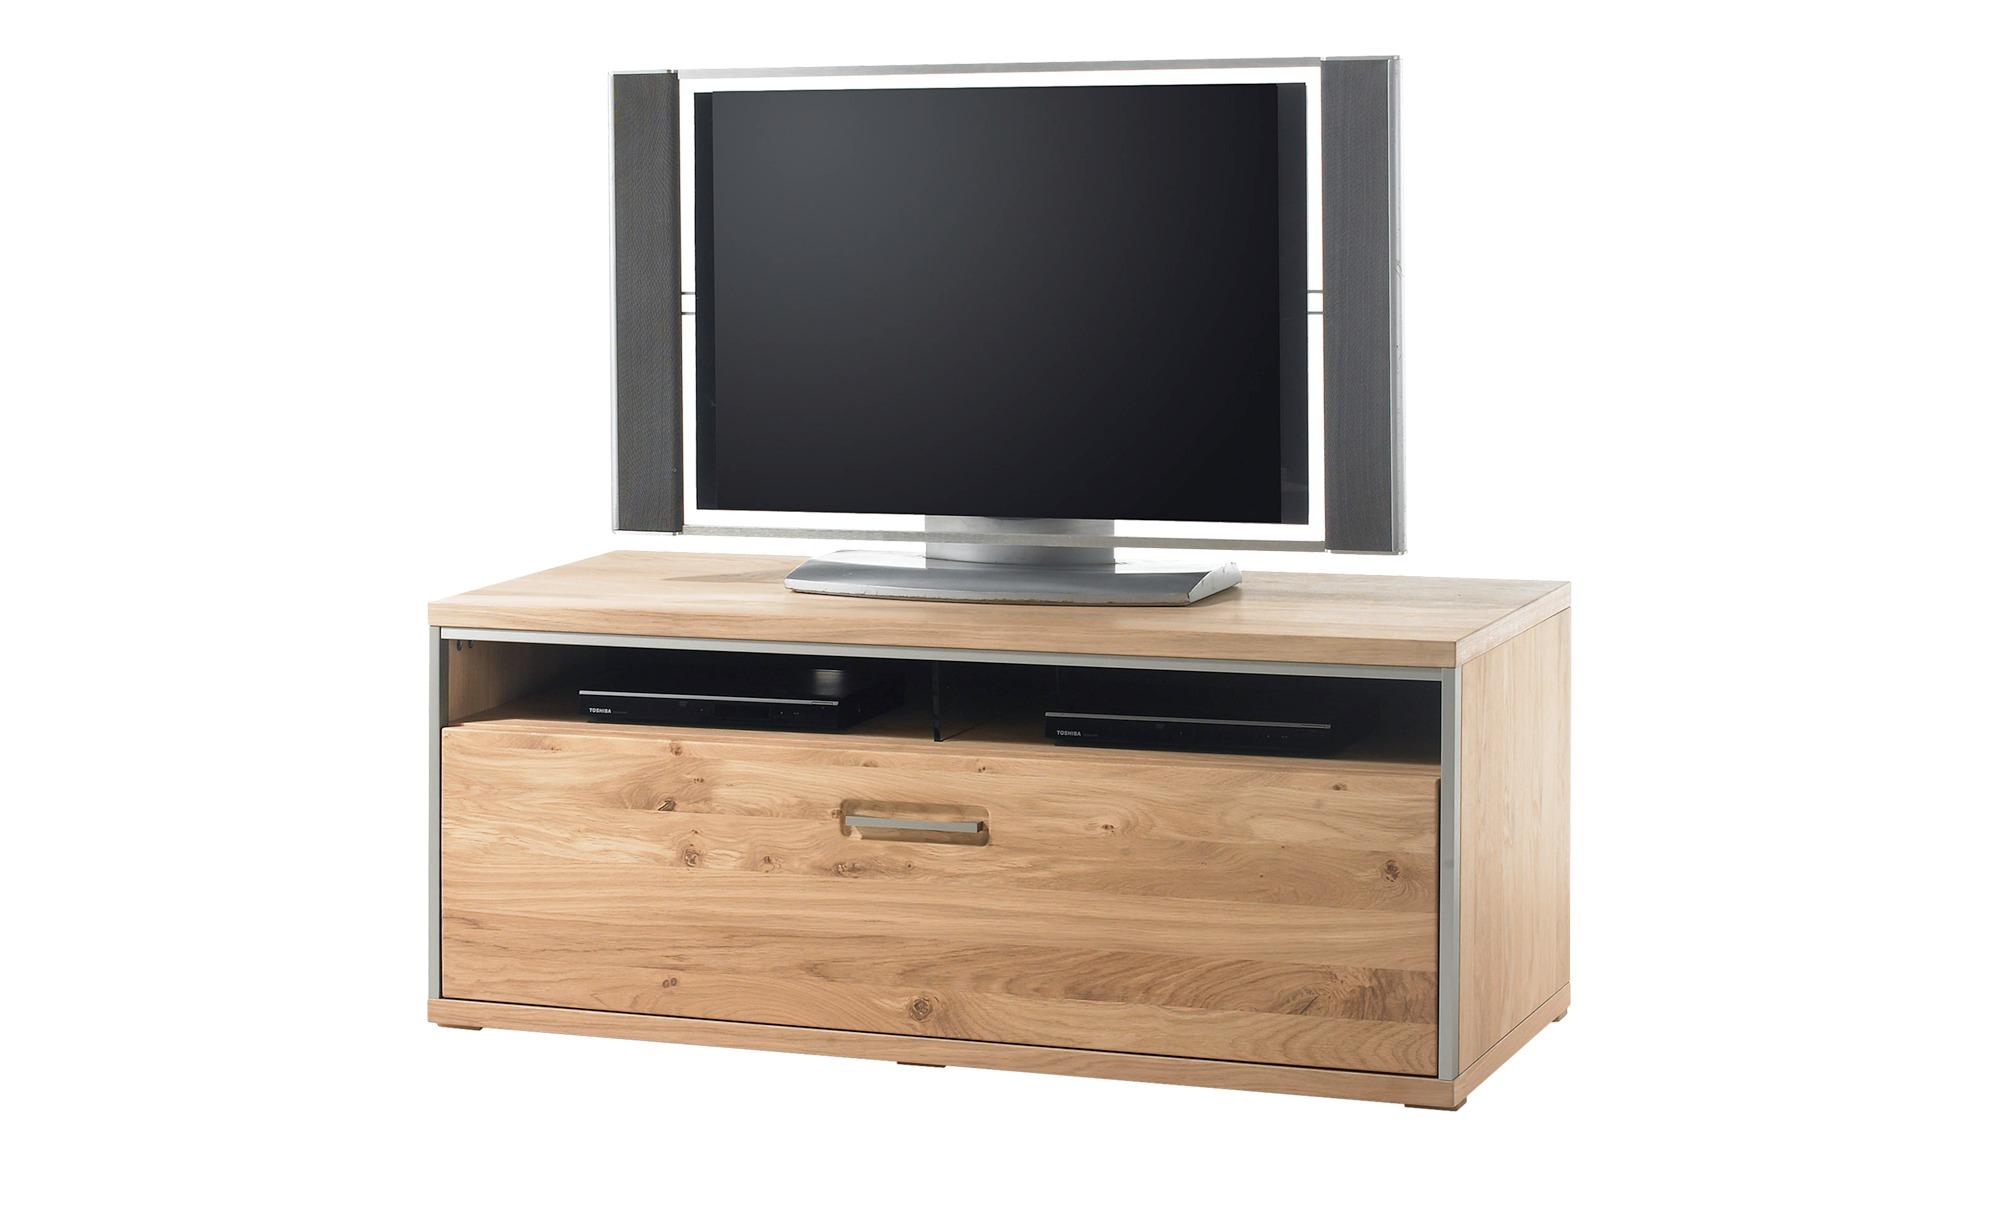 Woodford TV-Element   Duo ¦ Maße (cm): B: 124 H: 51 T: 52 Kommoden & Sideboards > Lowboards - Höffner | Wohnzimmer > TV-HiFi-Möbel | Furniert - Holz - Metall | Möbel Höffner DE